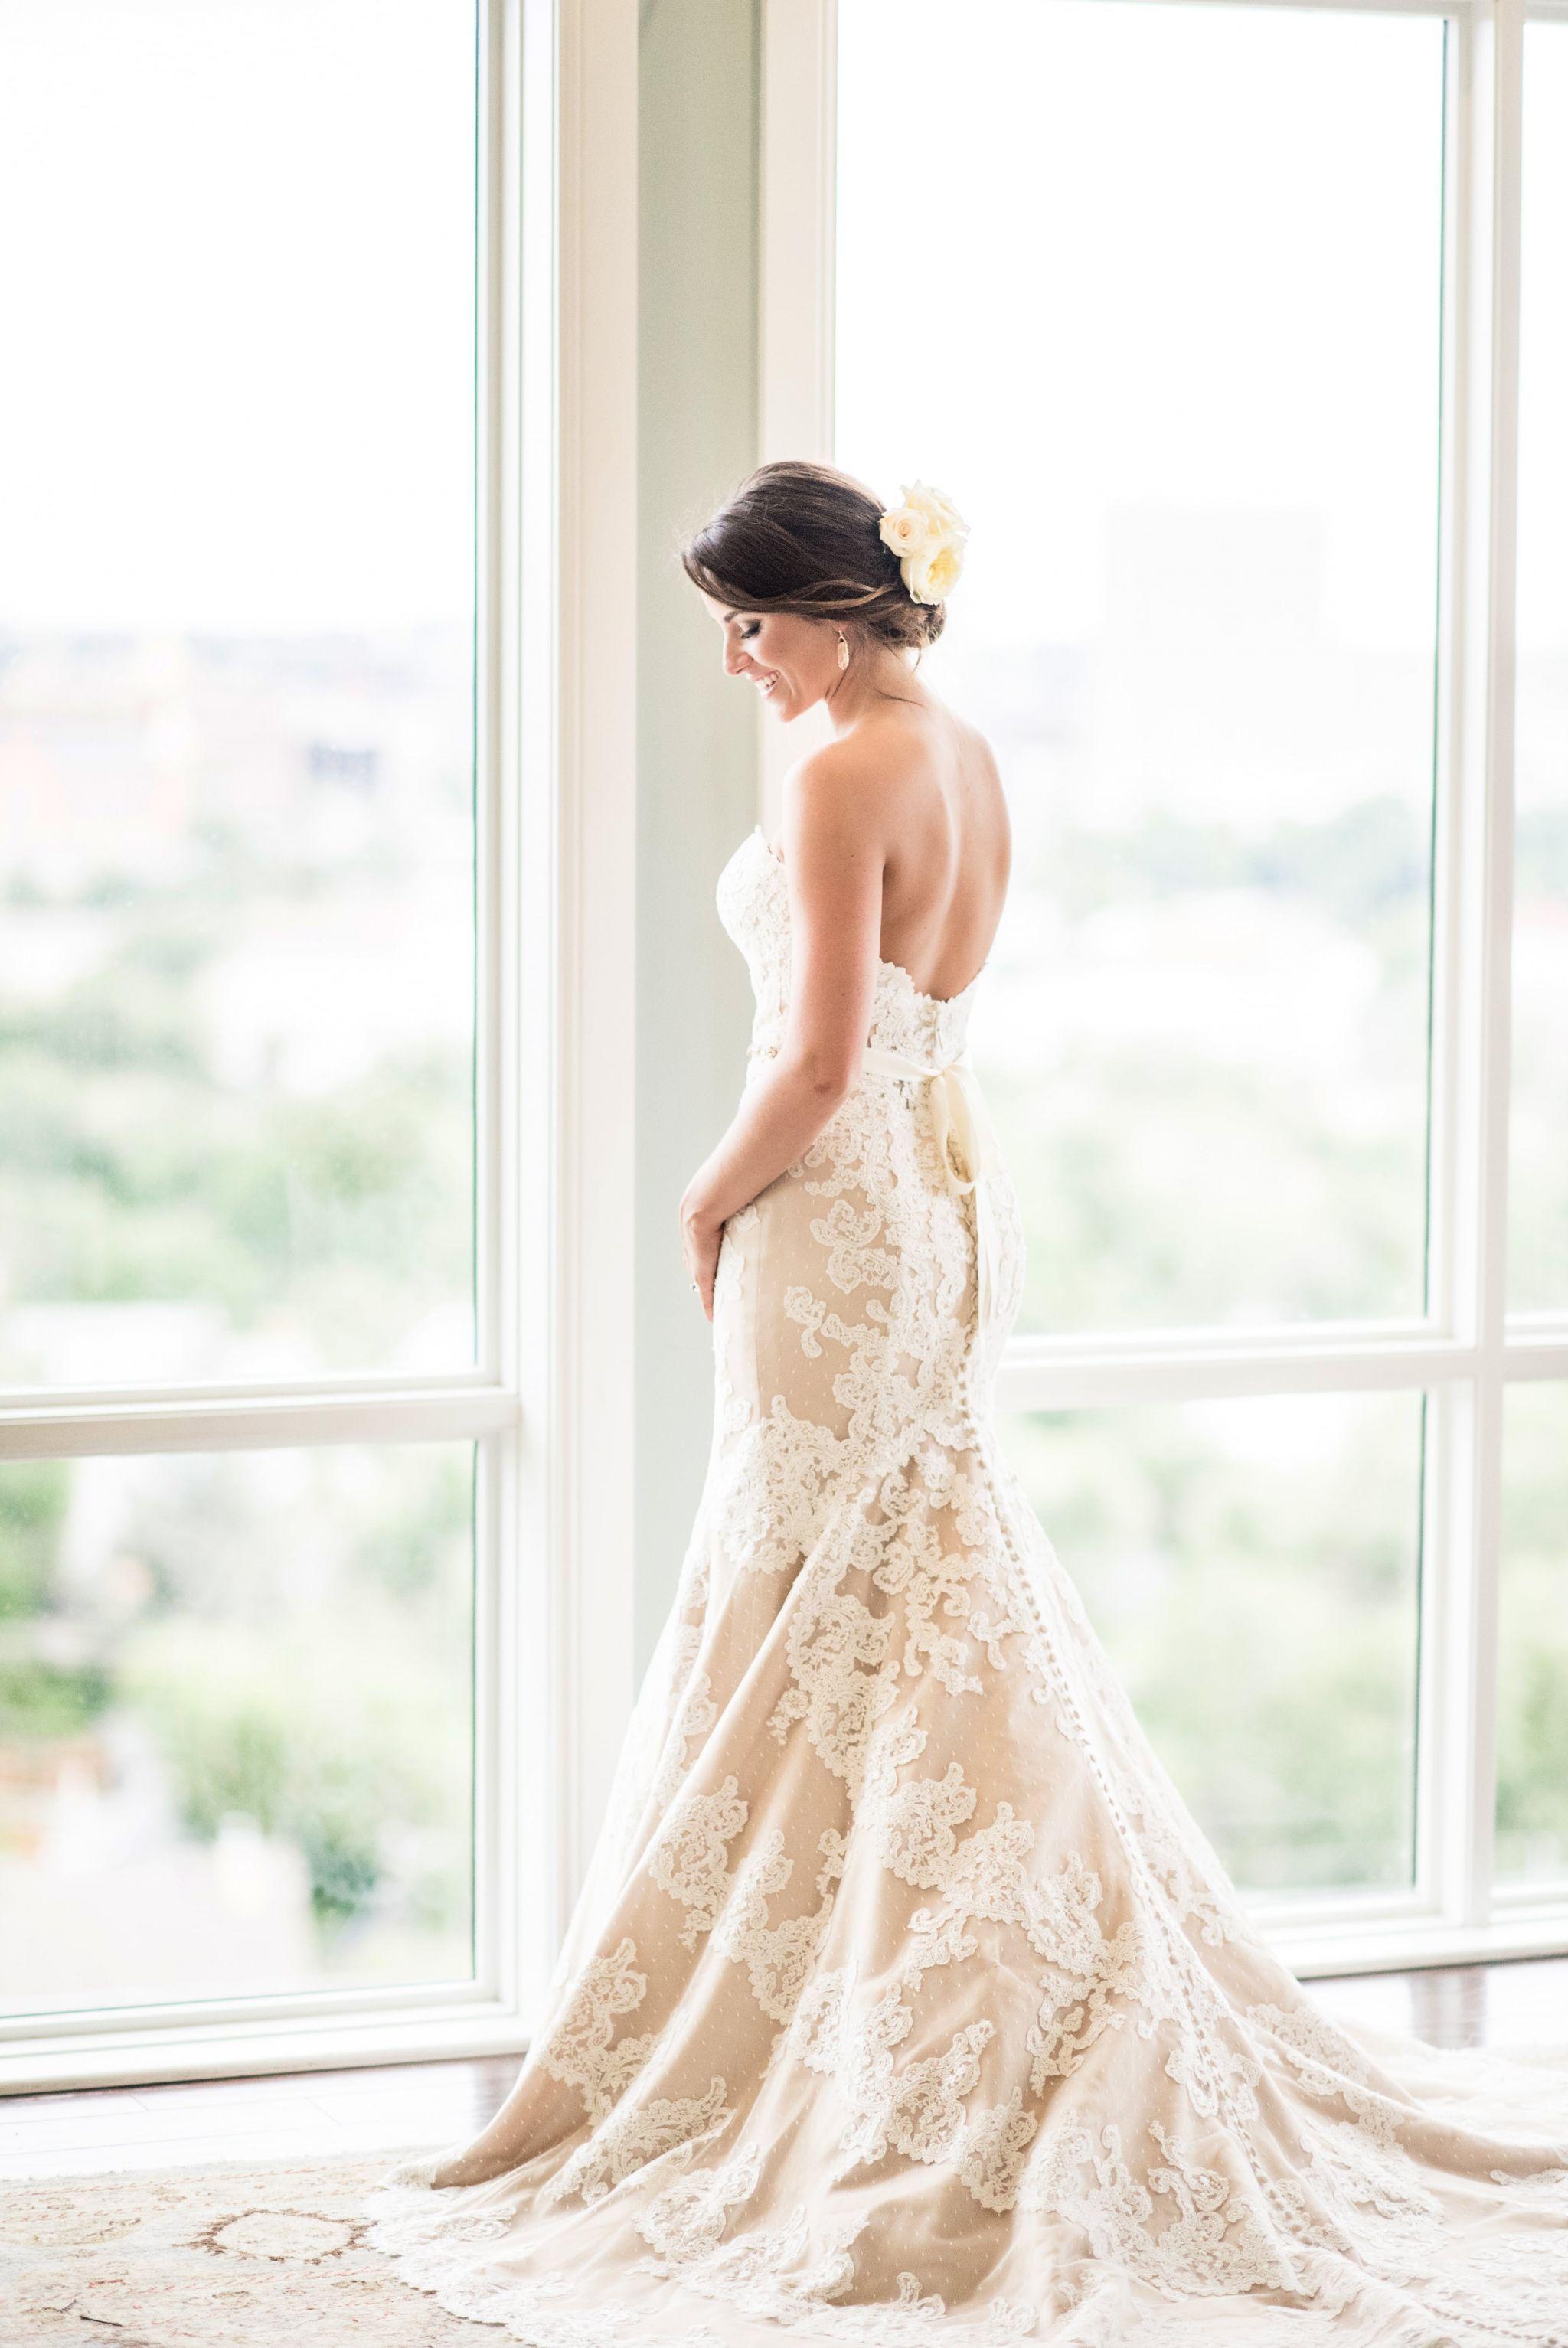 Matthew Christopher Emma Wedding Dress Used, Size 8